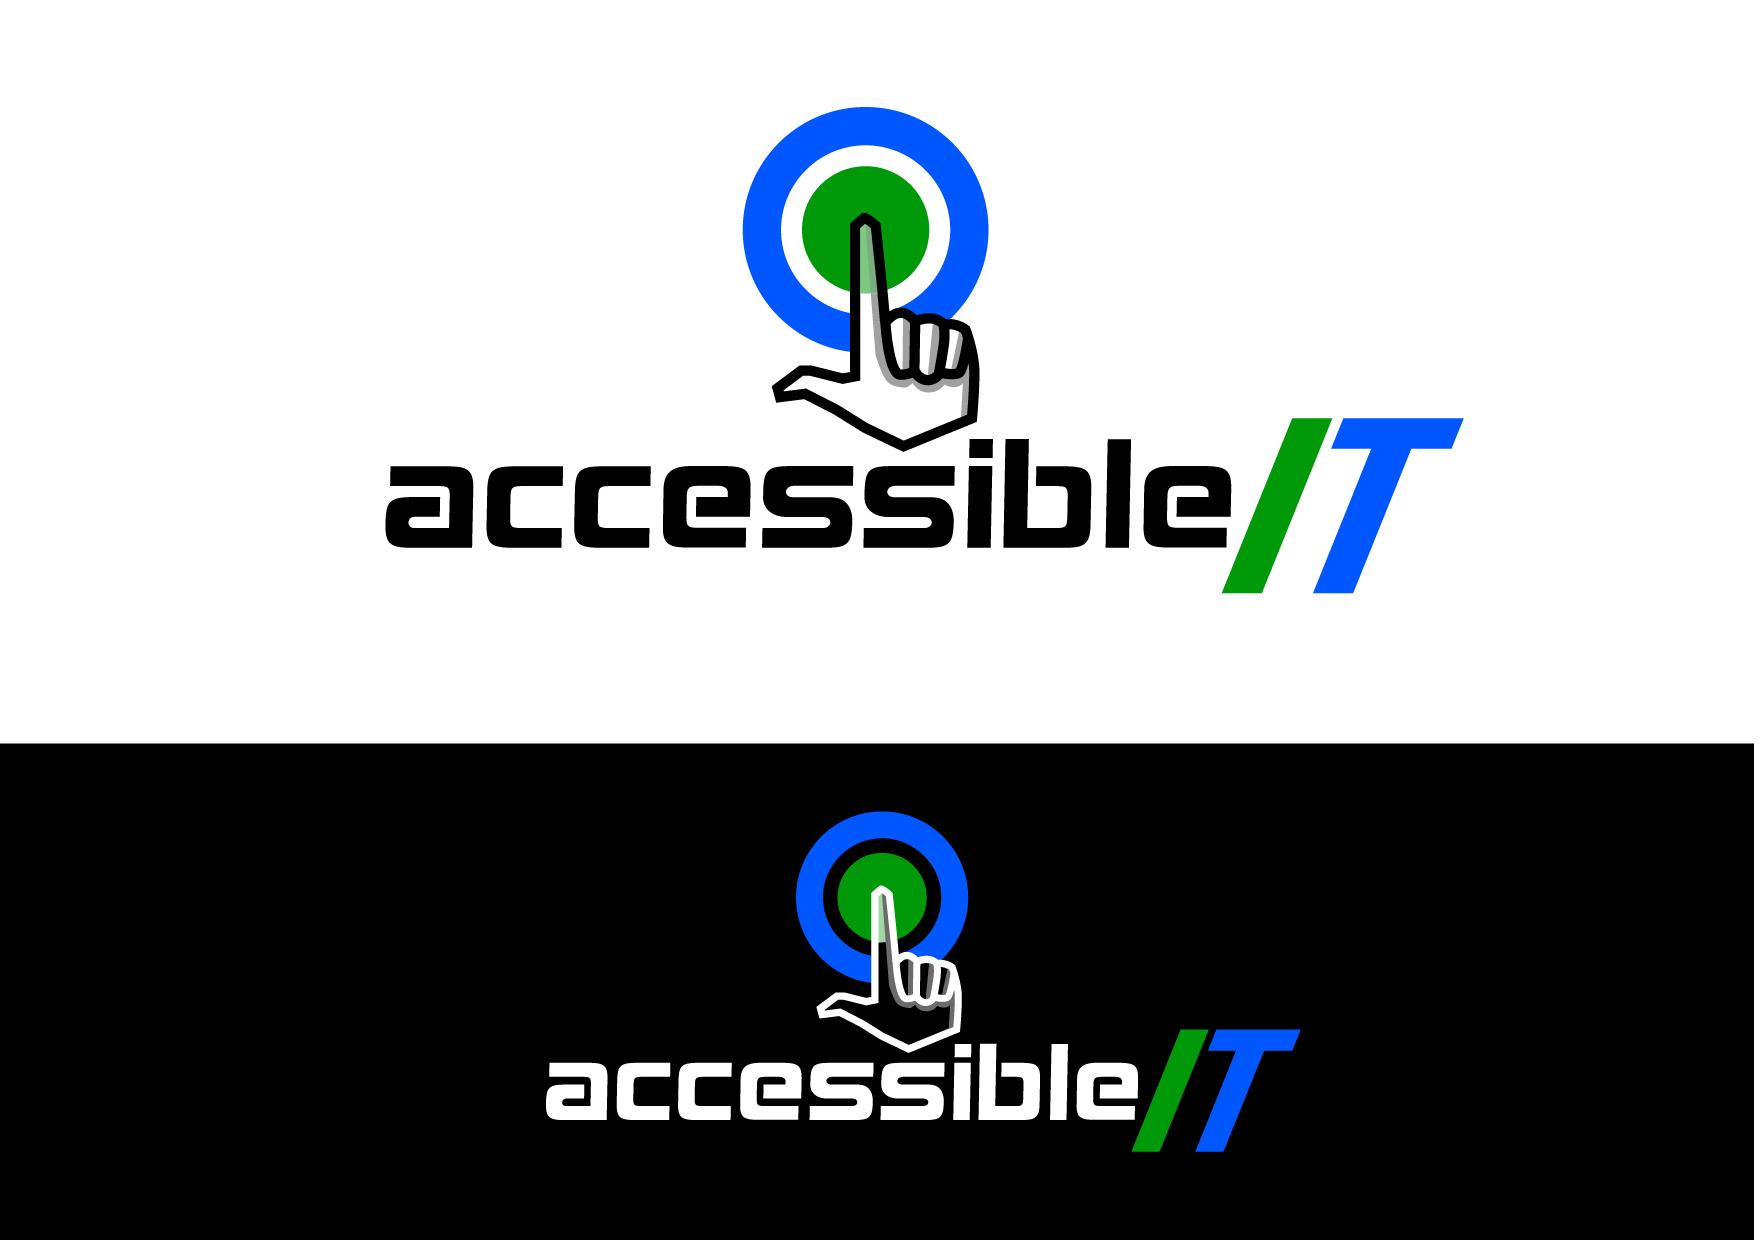 Logo Design by Wilfredo Mendoza - Entry No. 222 in the Logo Design Contest Logo Design Needed for Exciting New Company Accessible IT.